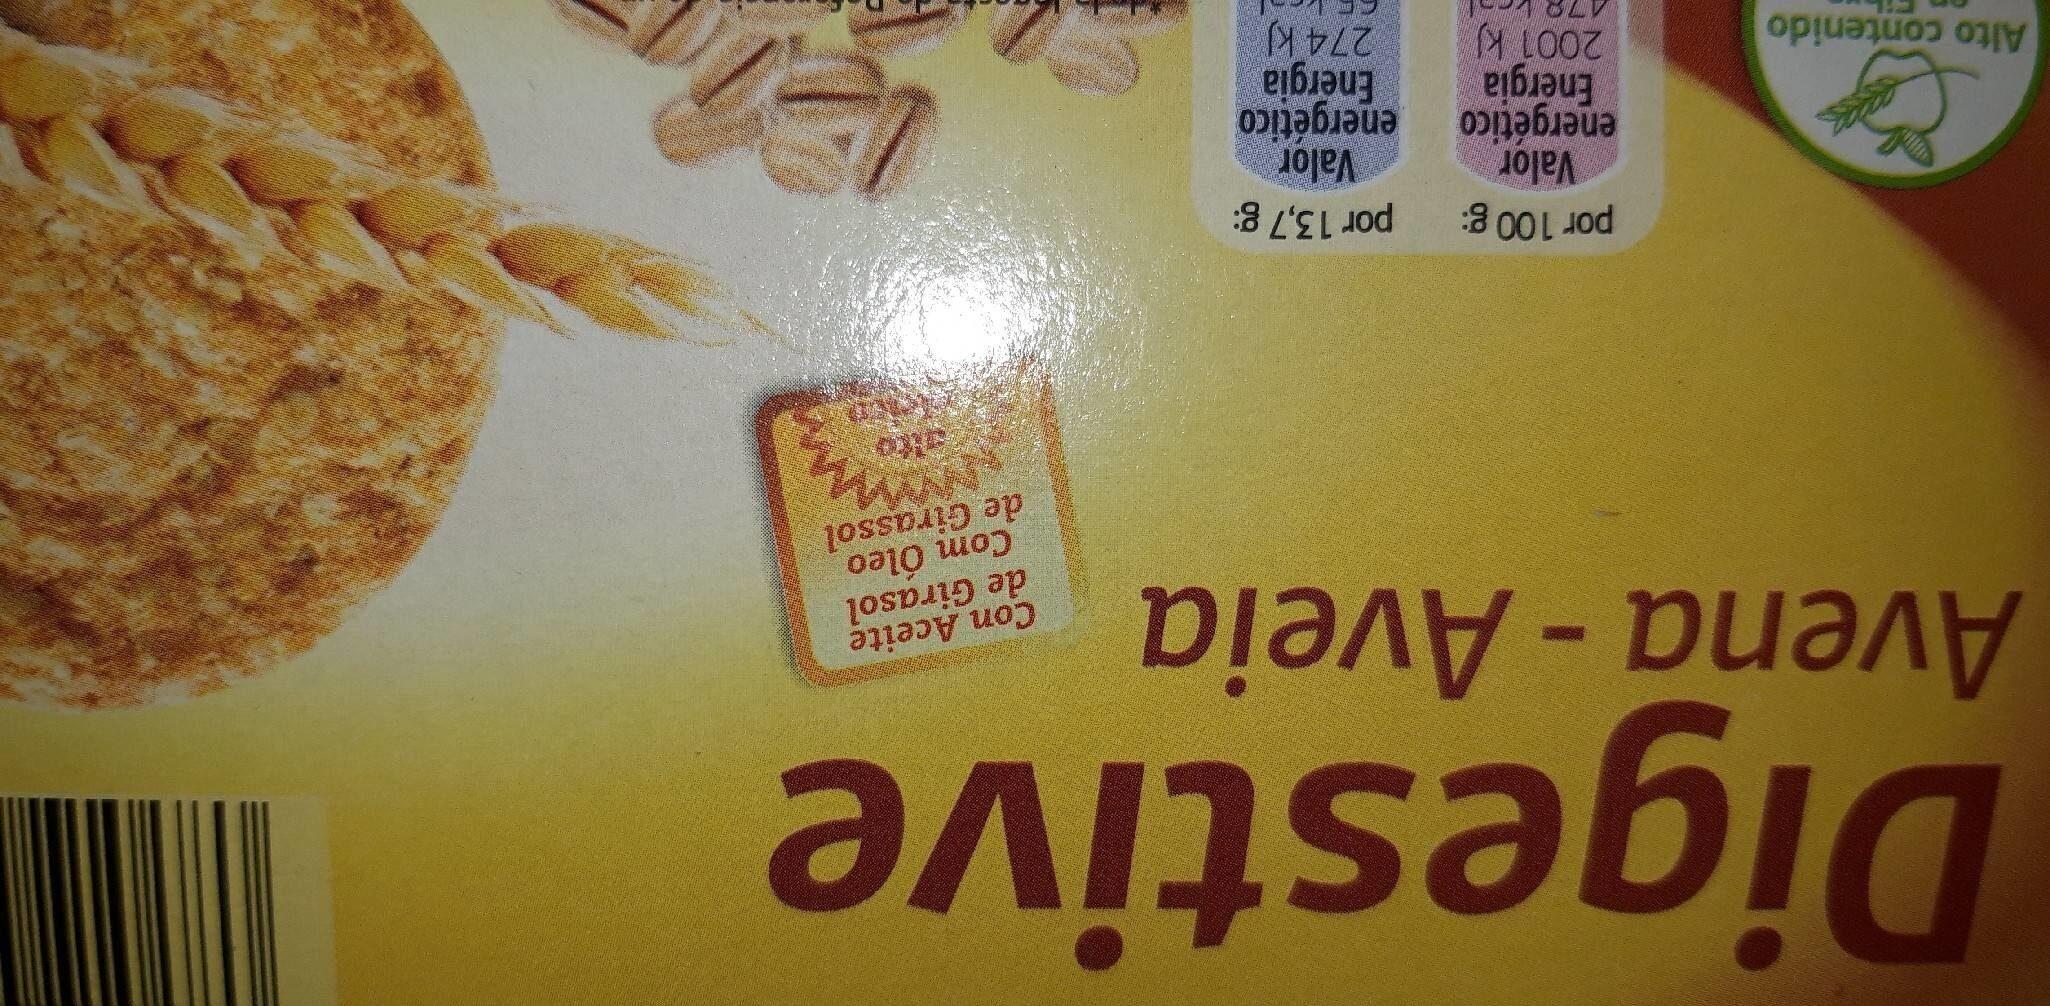 Digestive avena - Producto - es